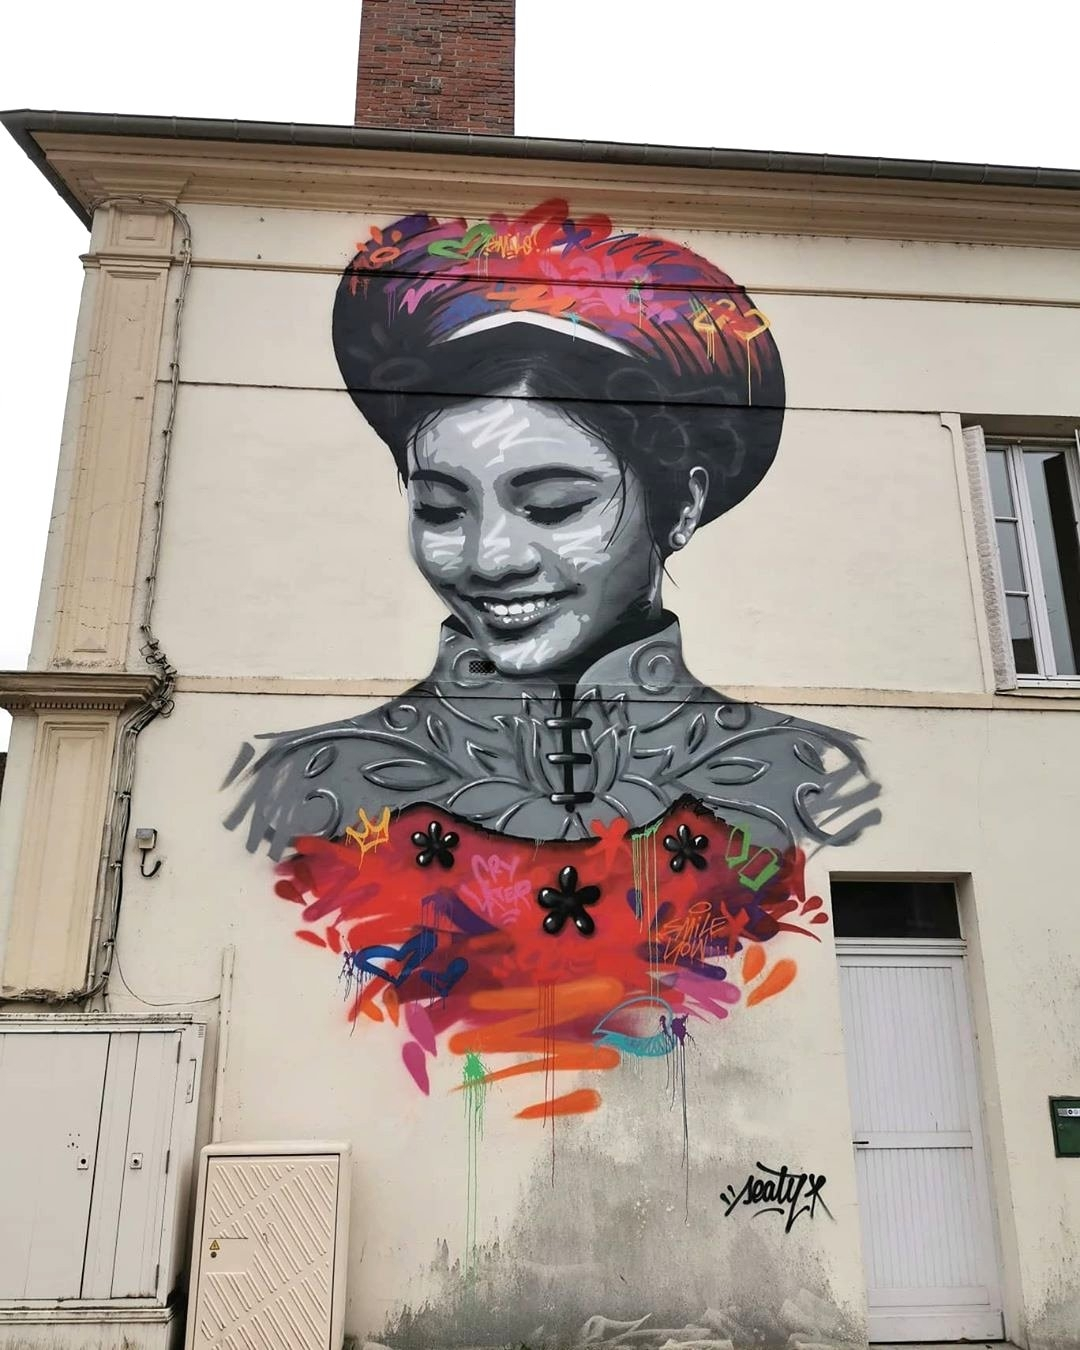 Seaty @ Dreux, France